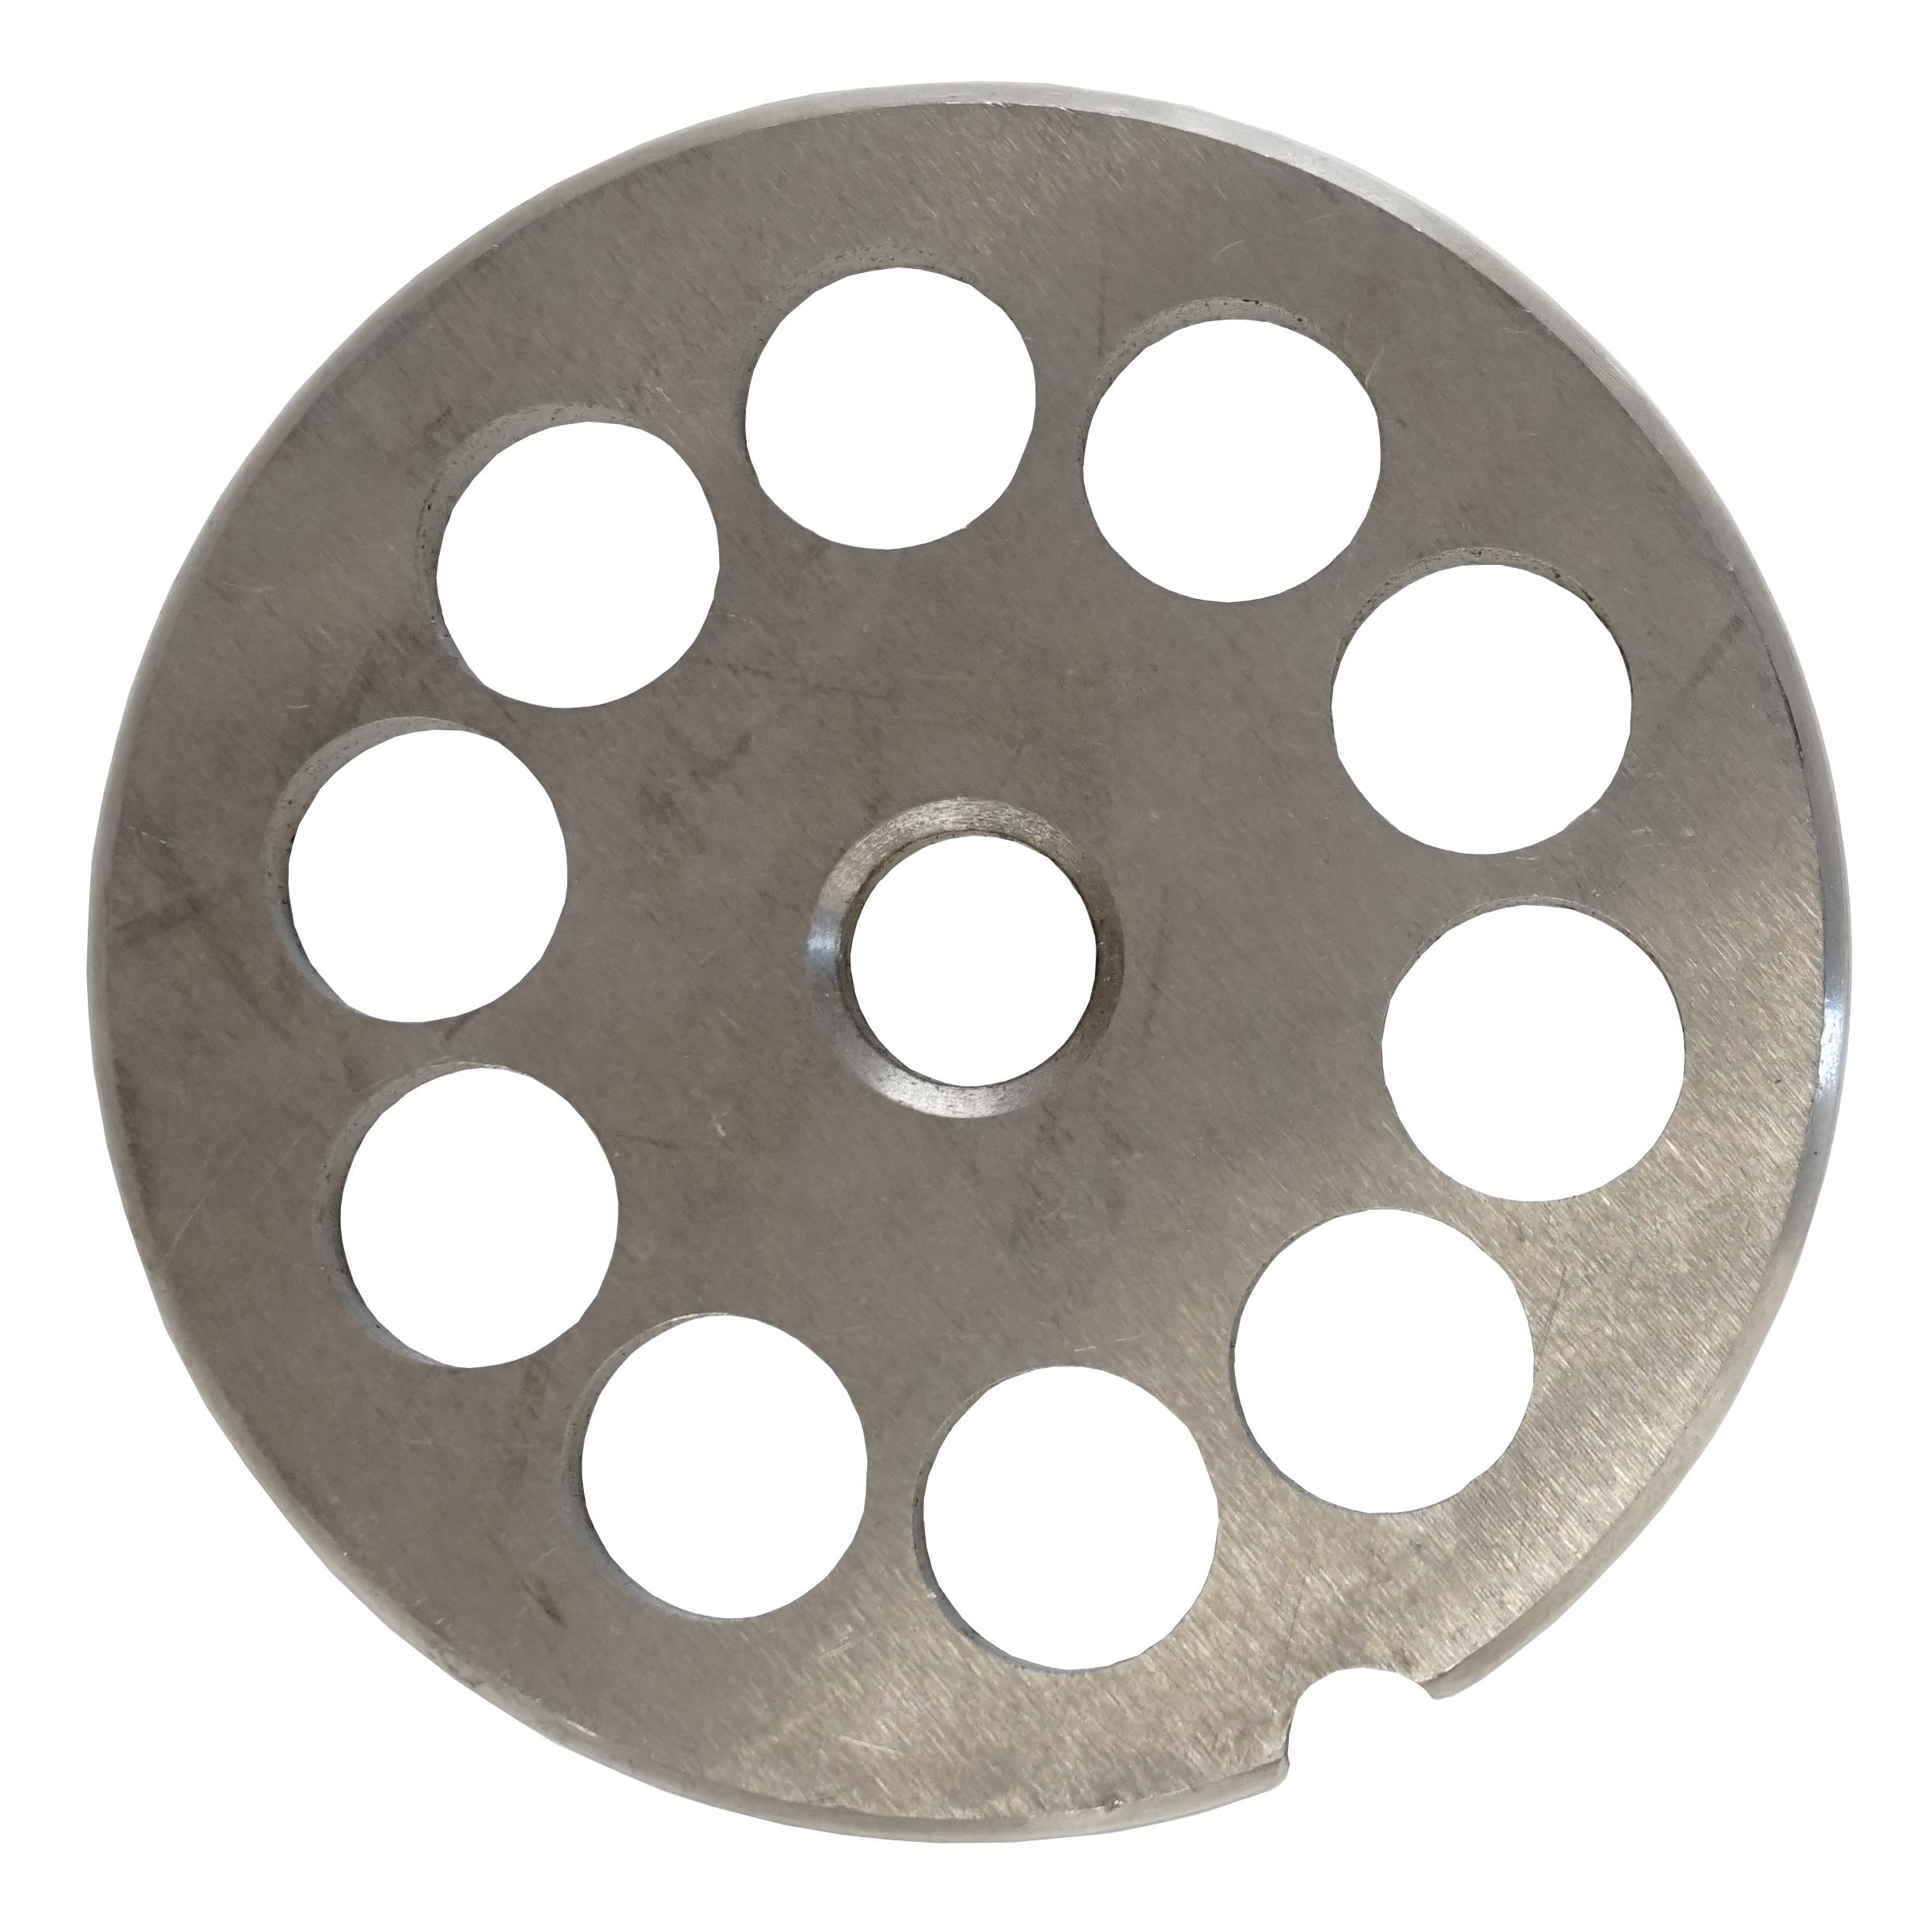 Globe L00774 meat grinder, accessories